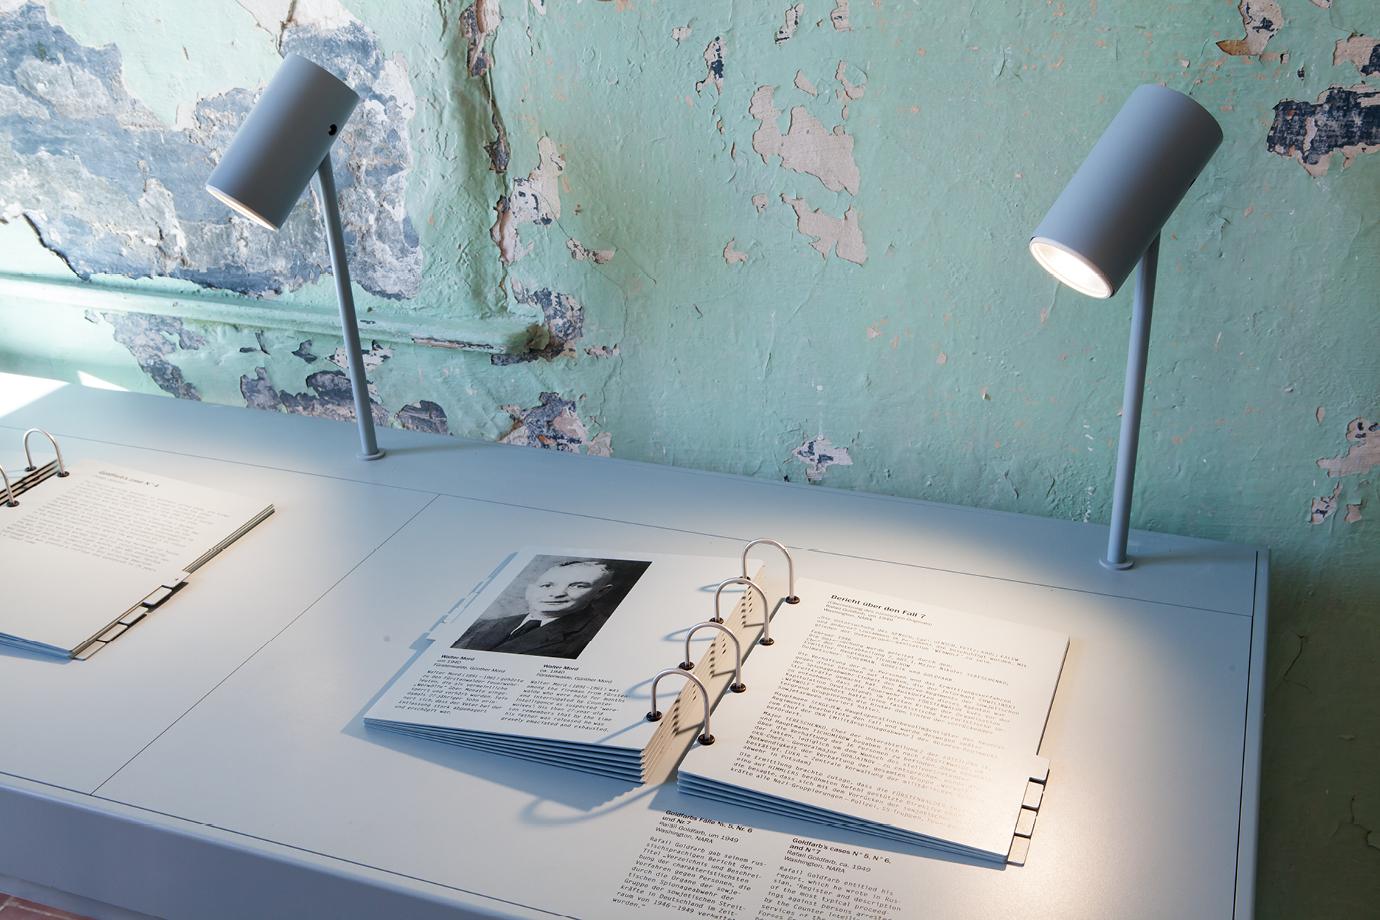 http://e-o-t.de/wordpress/wp-content/uploads/2017/04/2012_eot-Leistikow-Exhibition-10.jpg